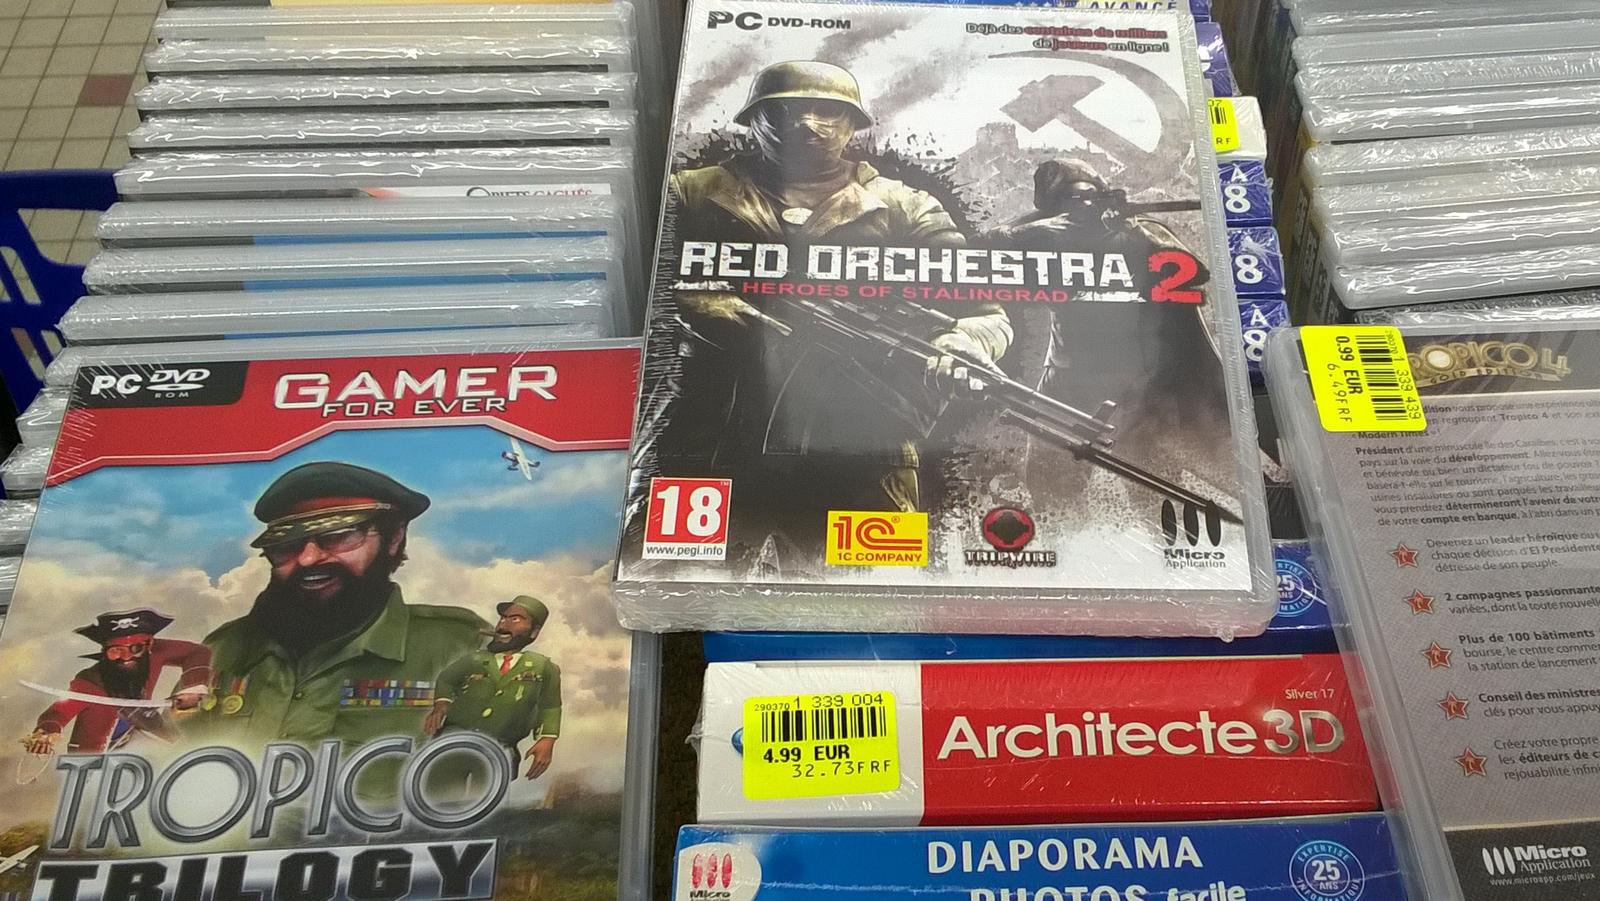 Jeu  PC Tropico 4 gold edition